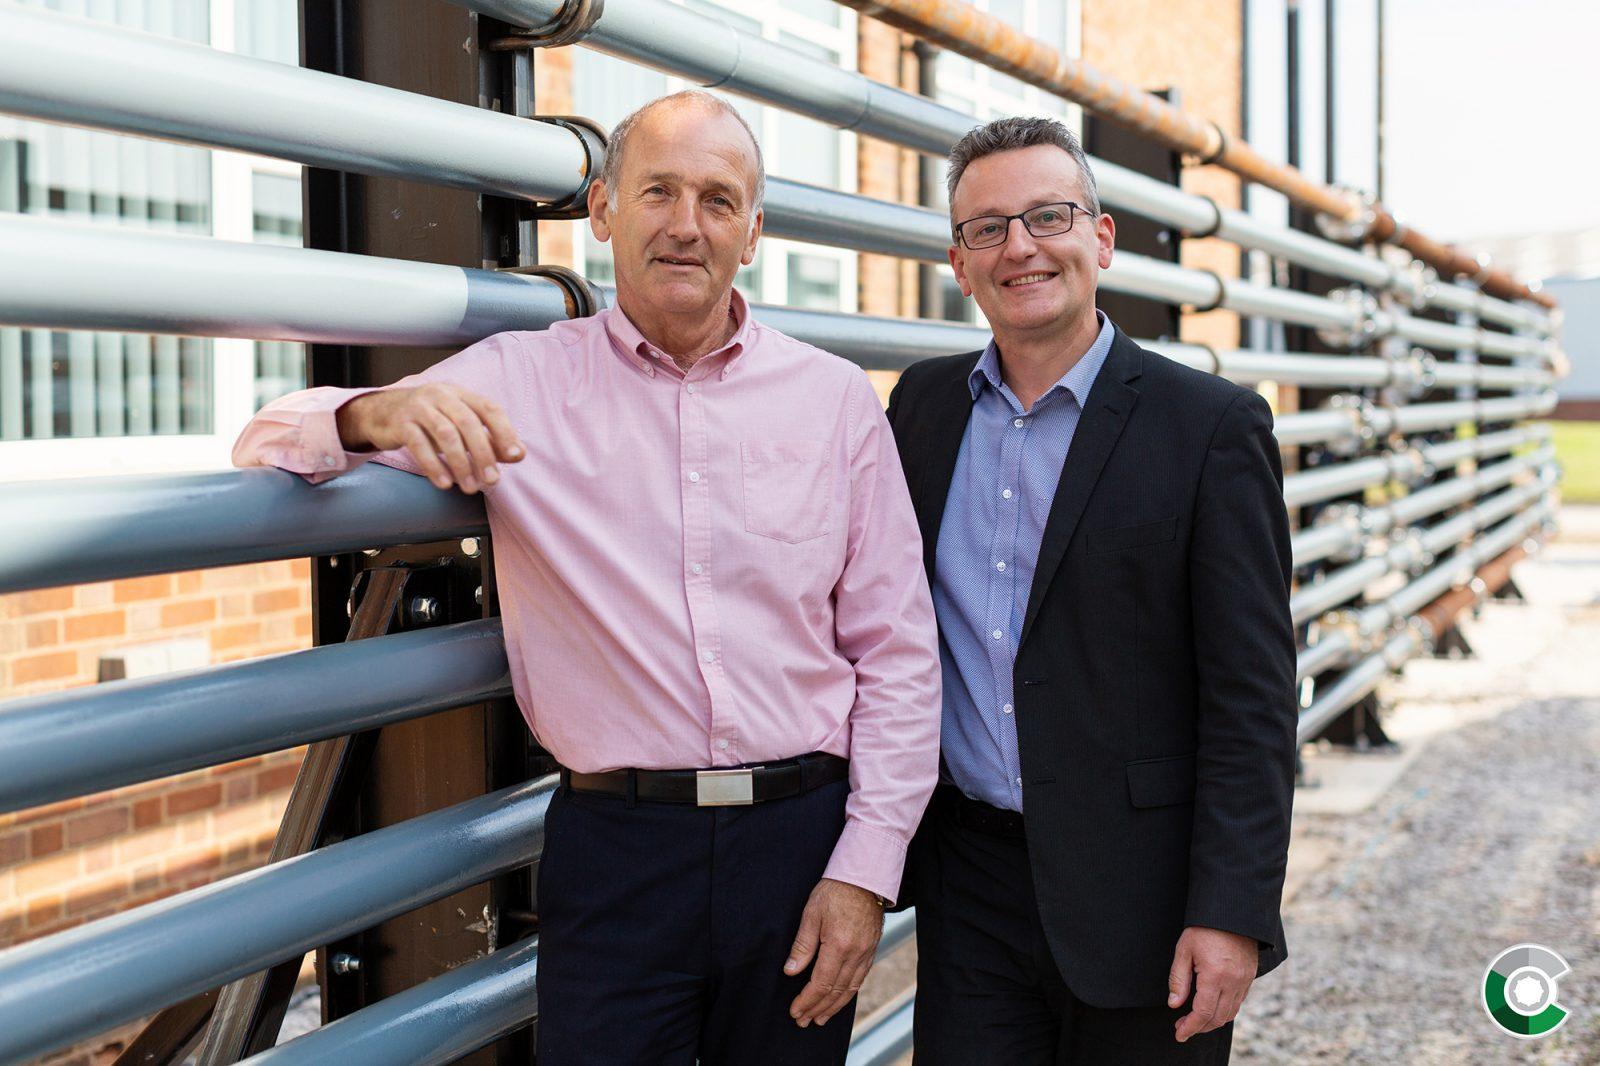 James Phipps Cokebusters Managing Director